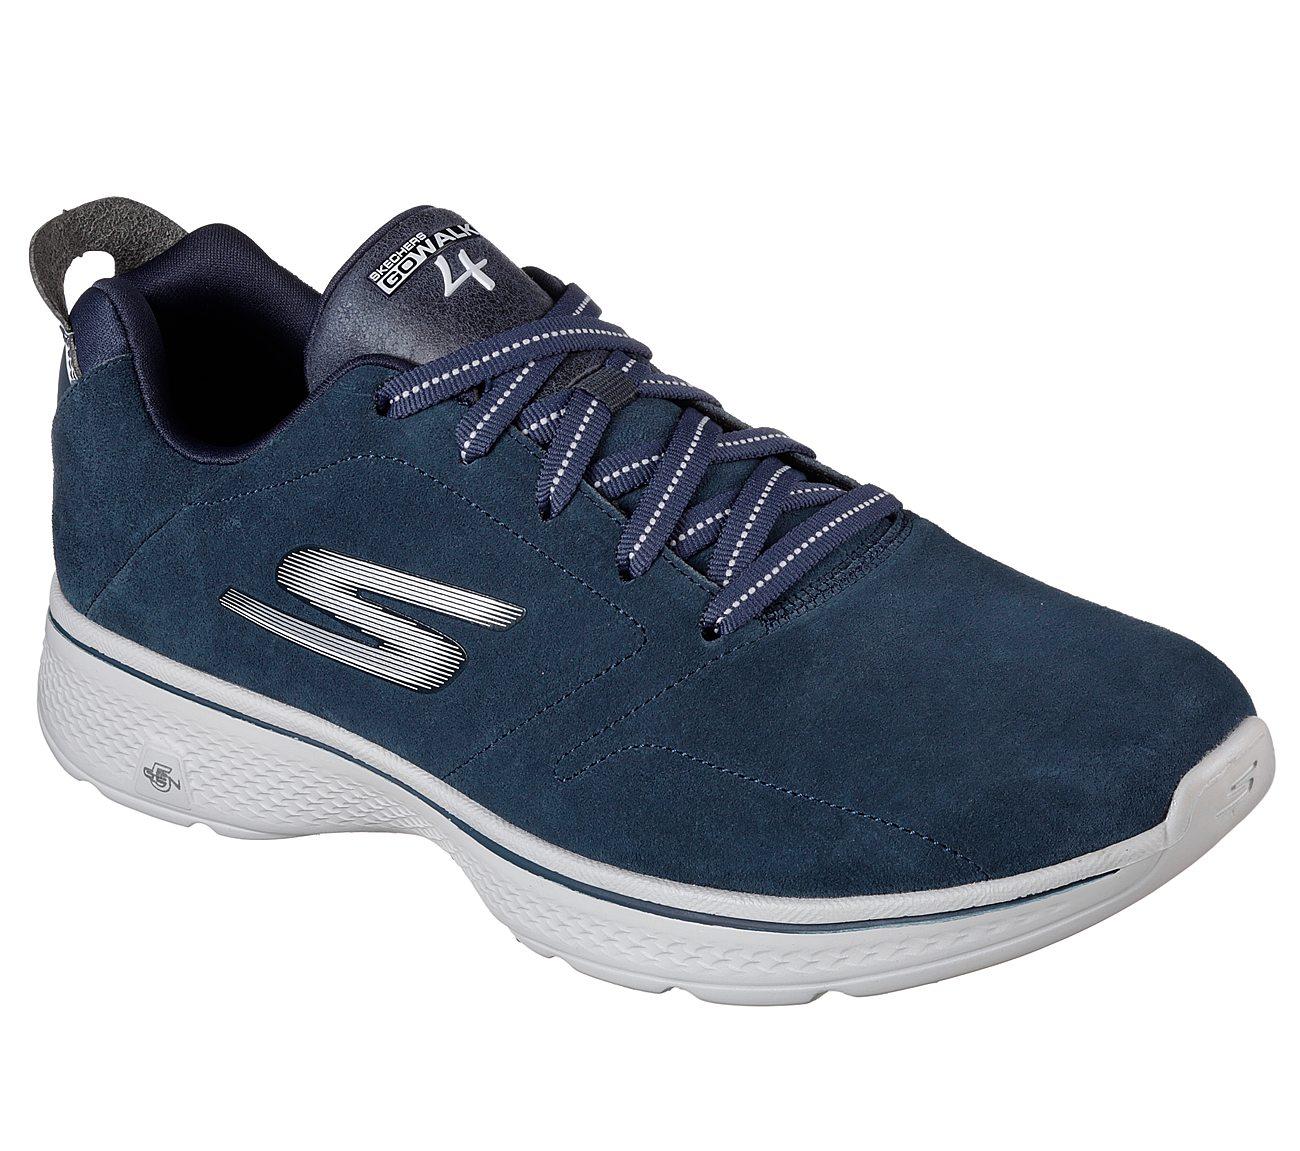 Skechers Herren Sneaker GO WALK 4 Art.Nr. 54165/NVGY blau/grau